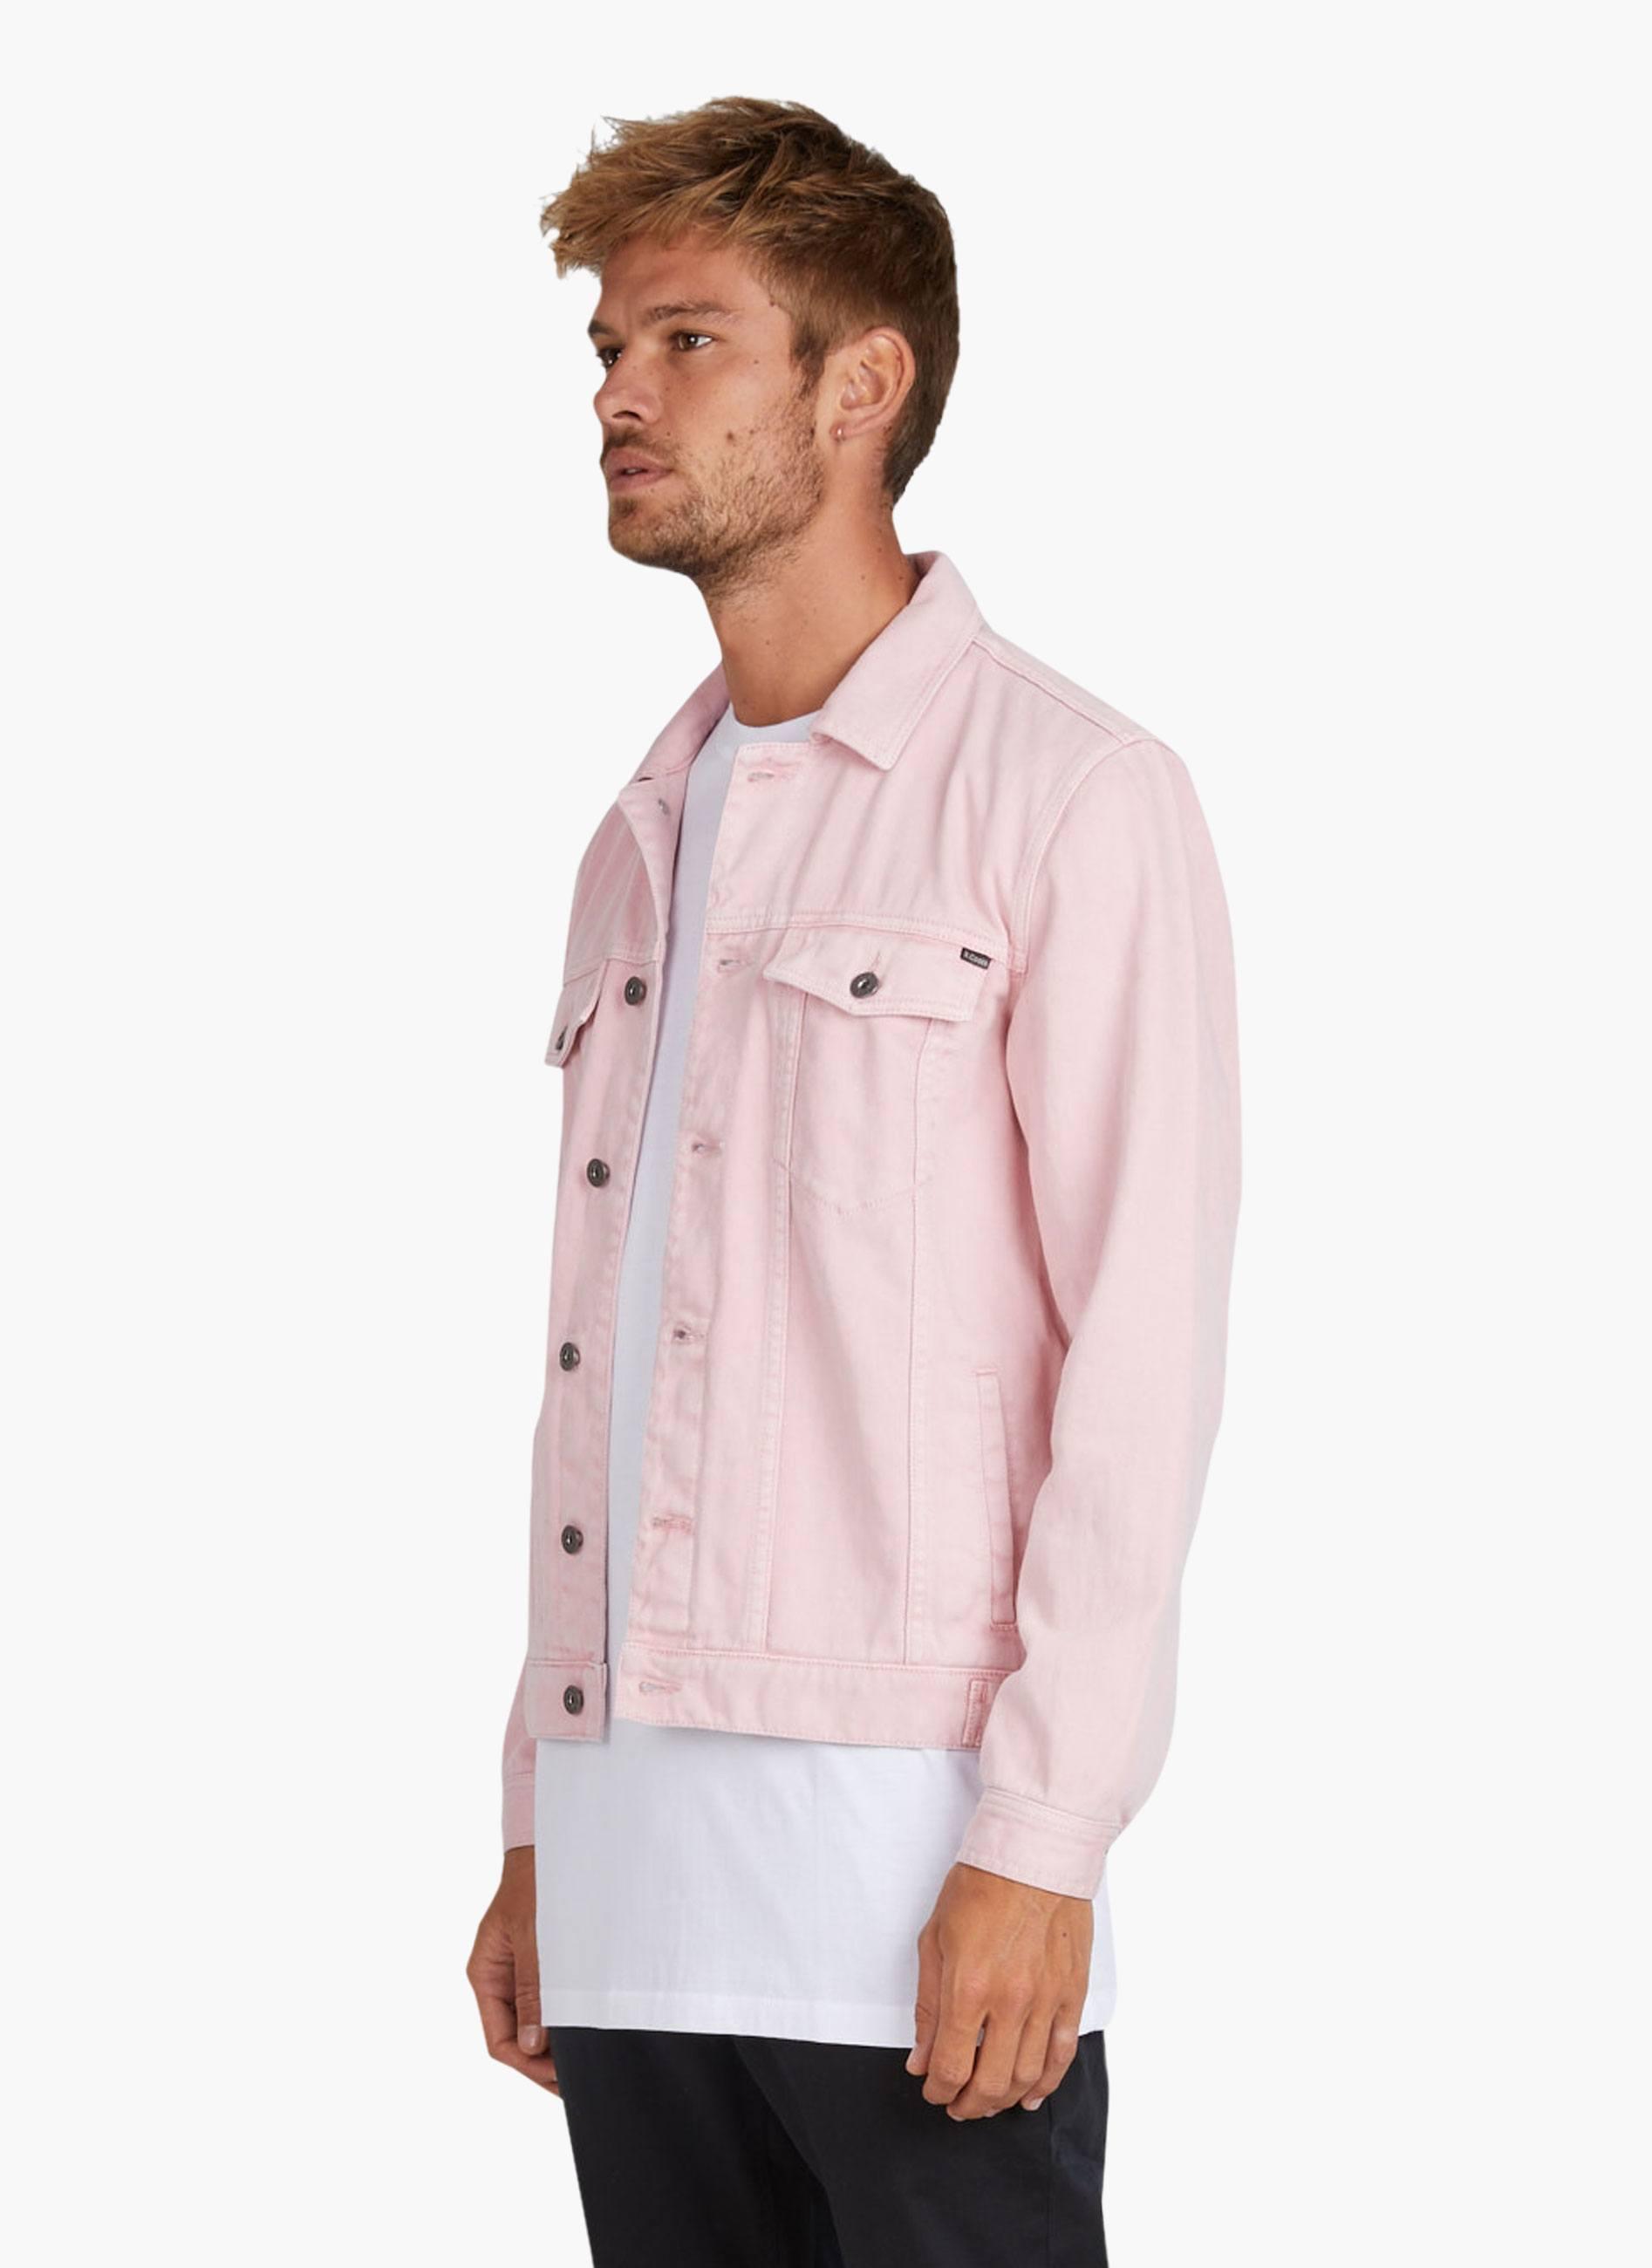 BARNEY-COOLS-B.Rigid-Jacket-Pink-02.jpg